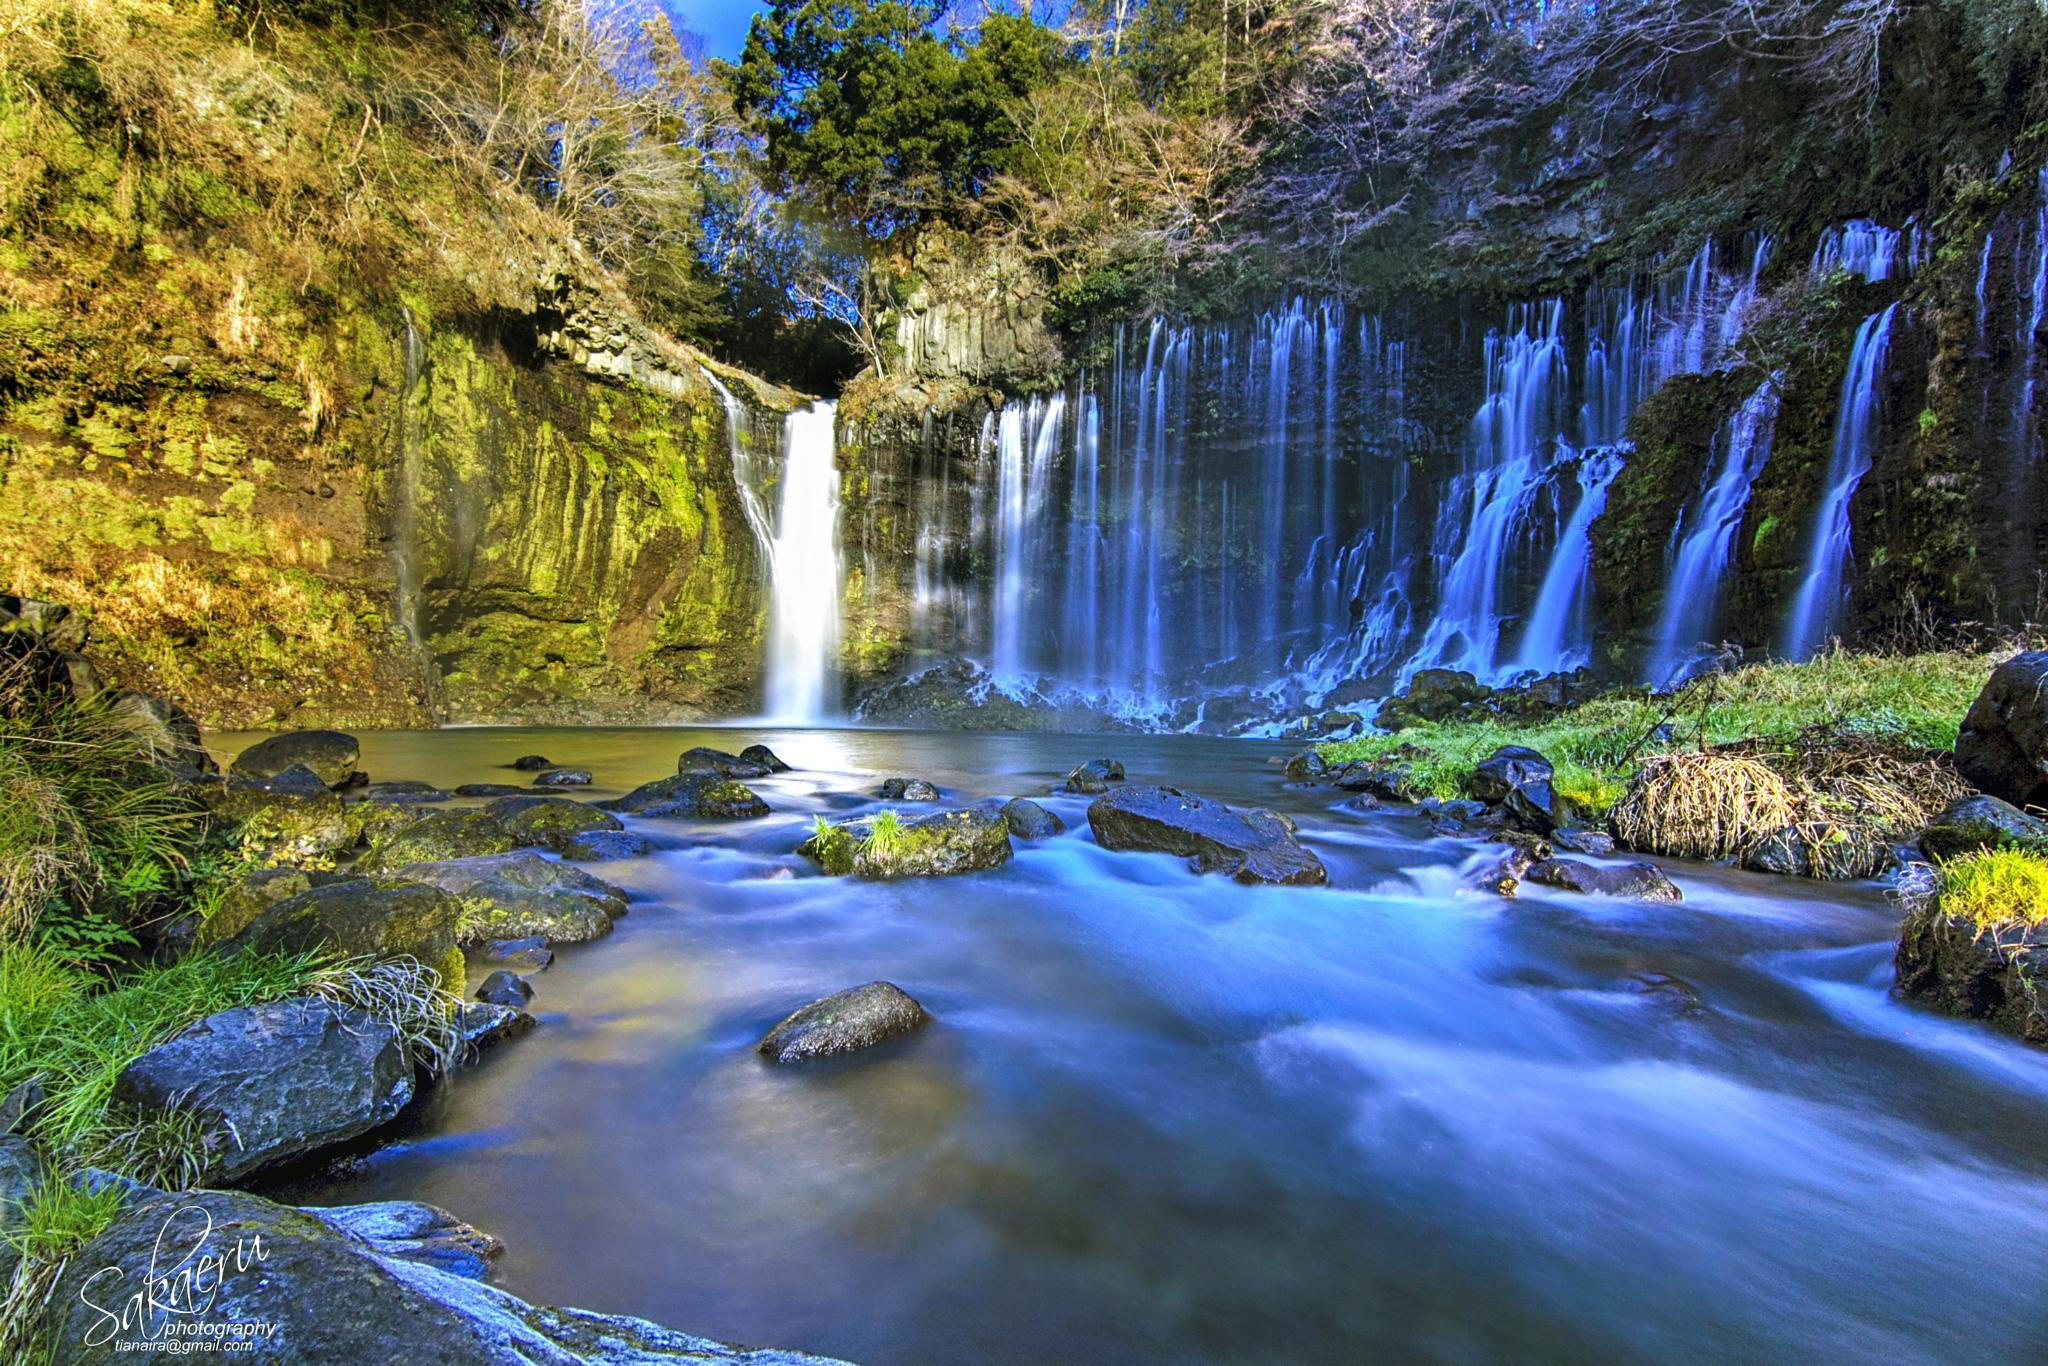 Shiraito waterfall by IAn Sakaeru